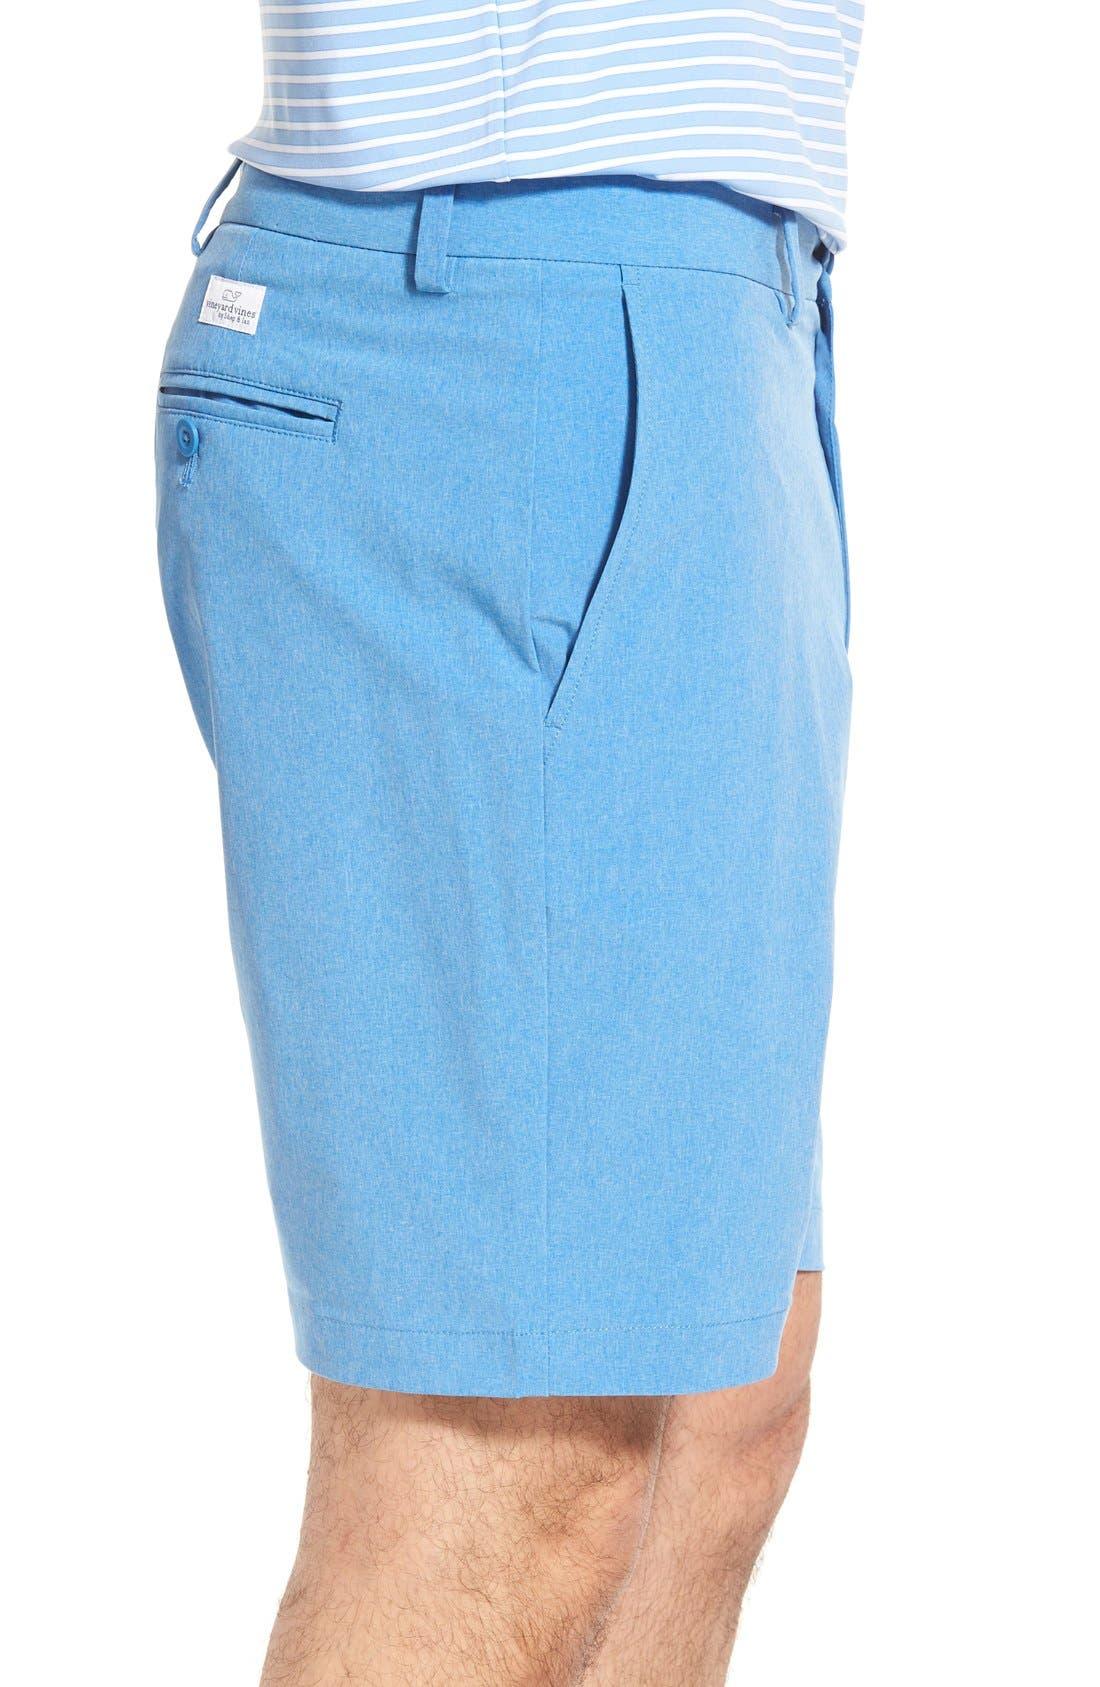 8 Inch Performance Breaker Shorts,                             Alternate thumbnail 52, color,